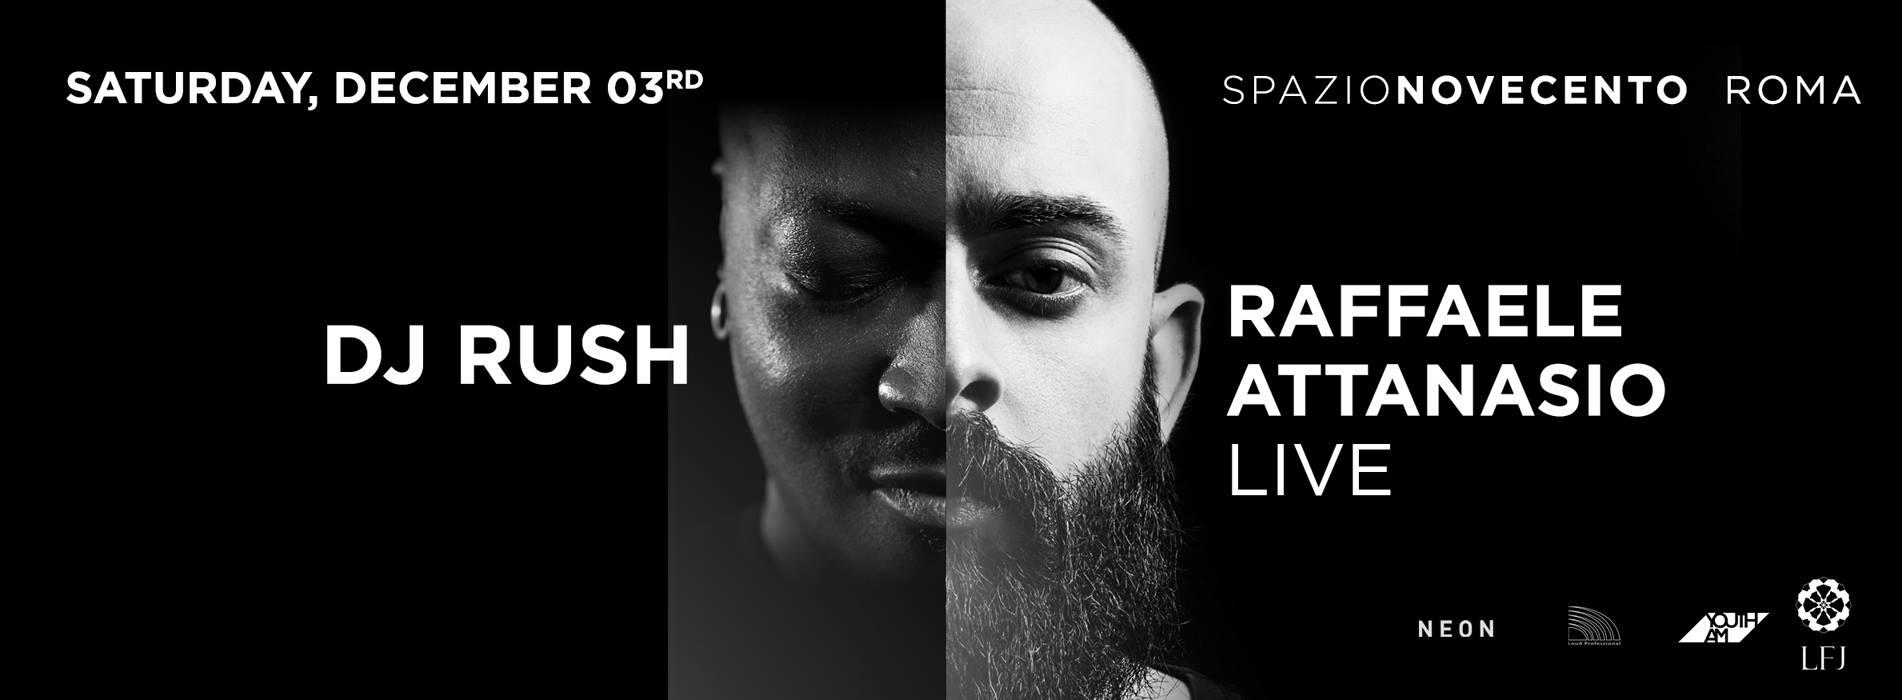 spazio-900-dj-rush-attanasio-03-12-2016